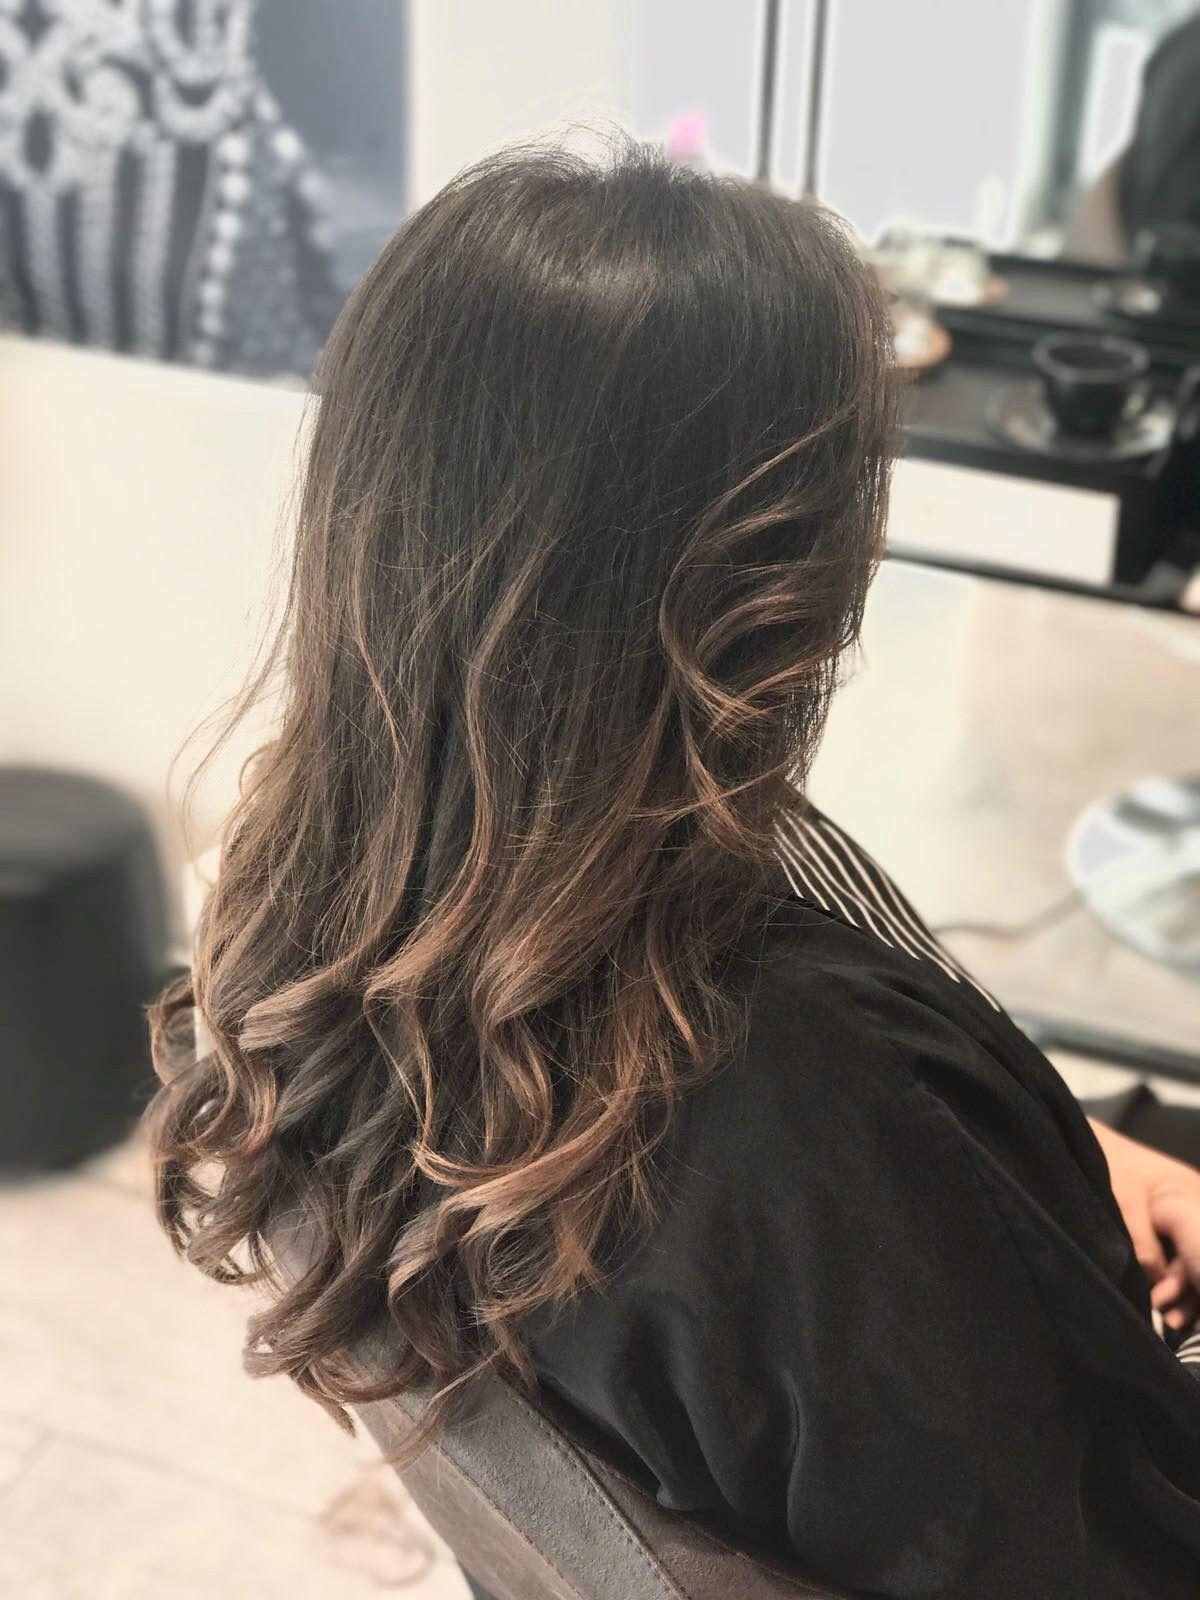 Love is in the #hair at #EricZemmourMonacoII ❤  #ericzemmour #monaco #montecarlo #lorealpro #iamlorealpro #haircolor #bohowaves #monmonaco #mymontecarlo #hairstylist #sashamonaco #federicomc #haircolor #principatodimonaco #frenchriviera #fashionblog #follow #ericzemmourmonaco #tbt #instahair #hairgoal #hairporn #hairinspo #hairinspiration #modernsalon #behindthechair #longhair